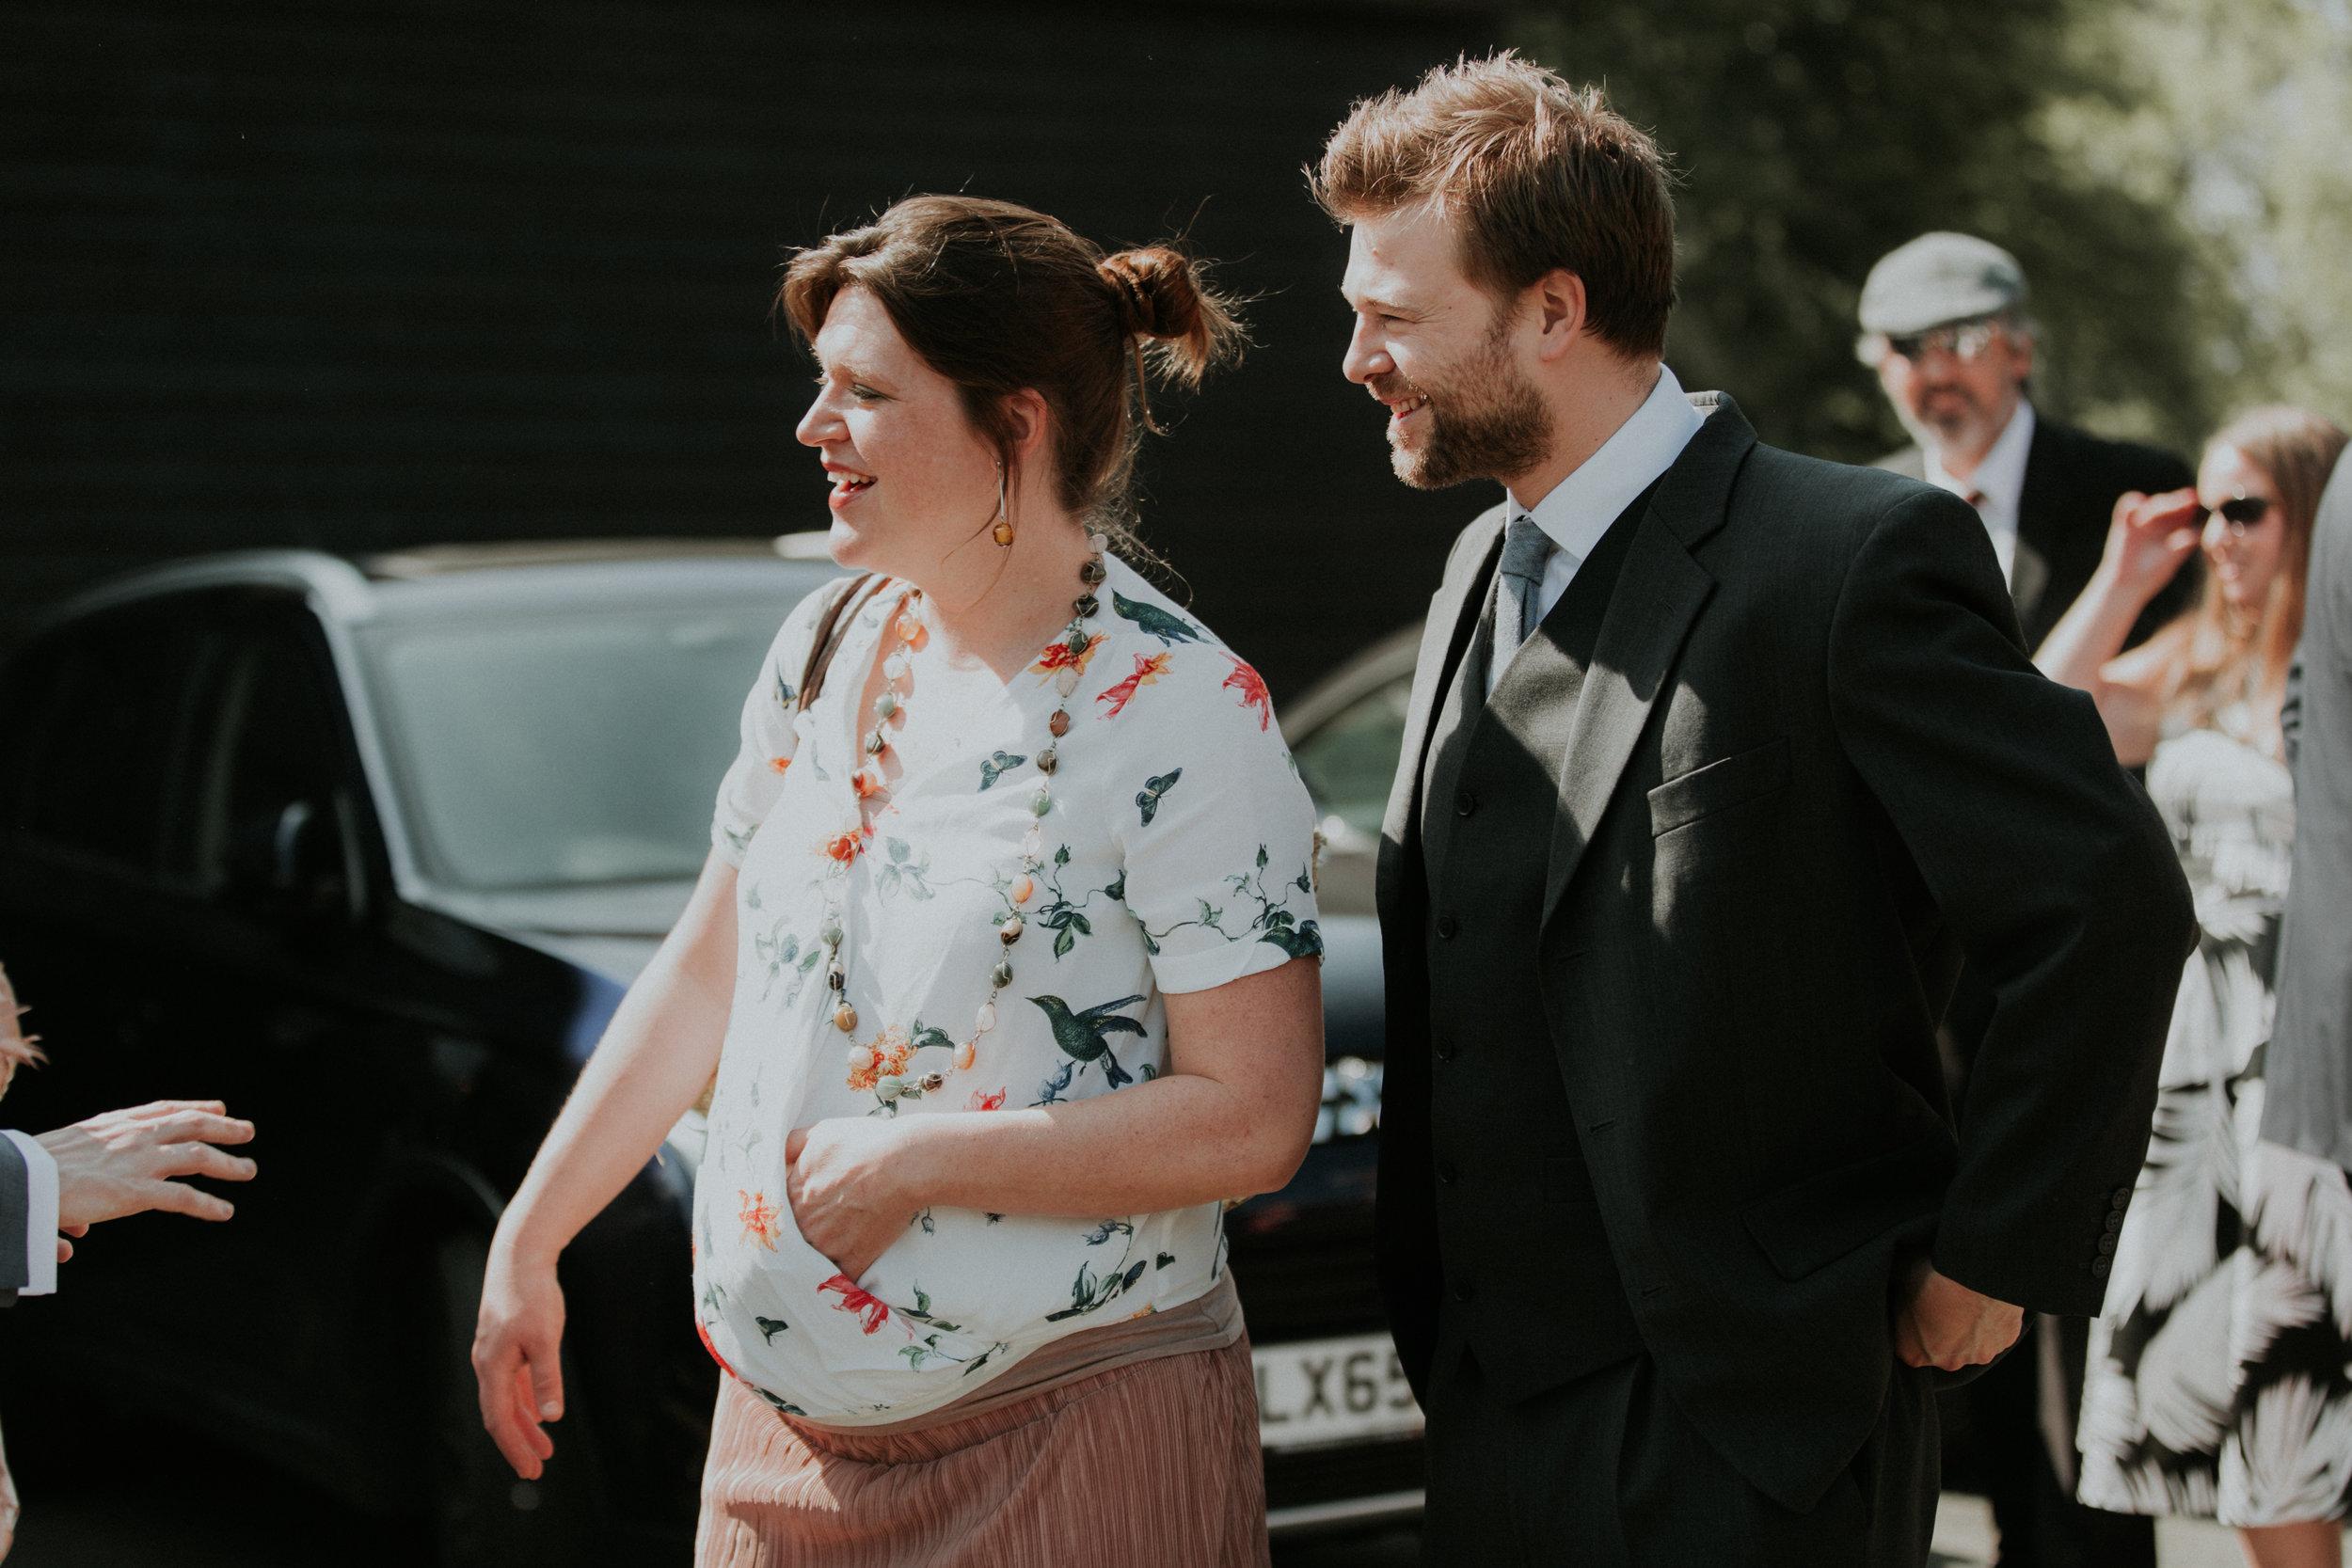 pregnant wedding guest